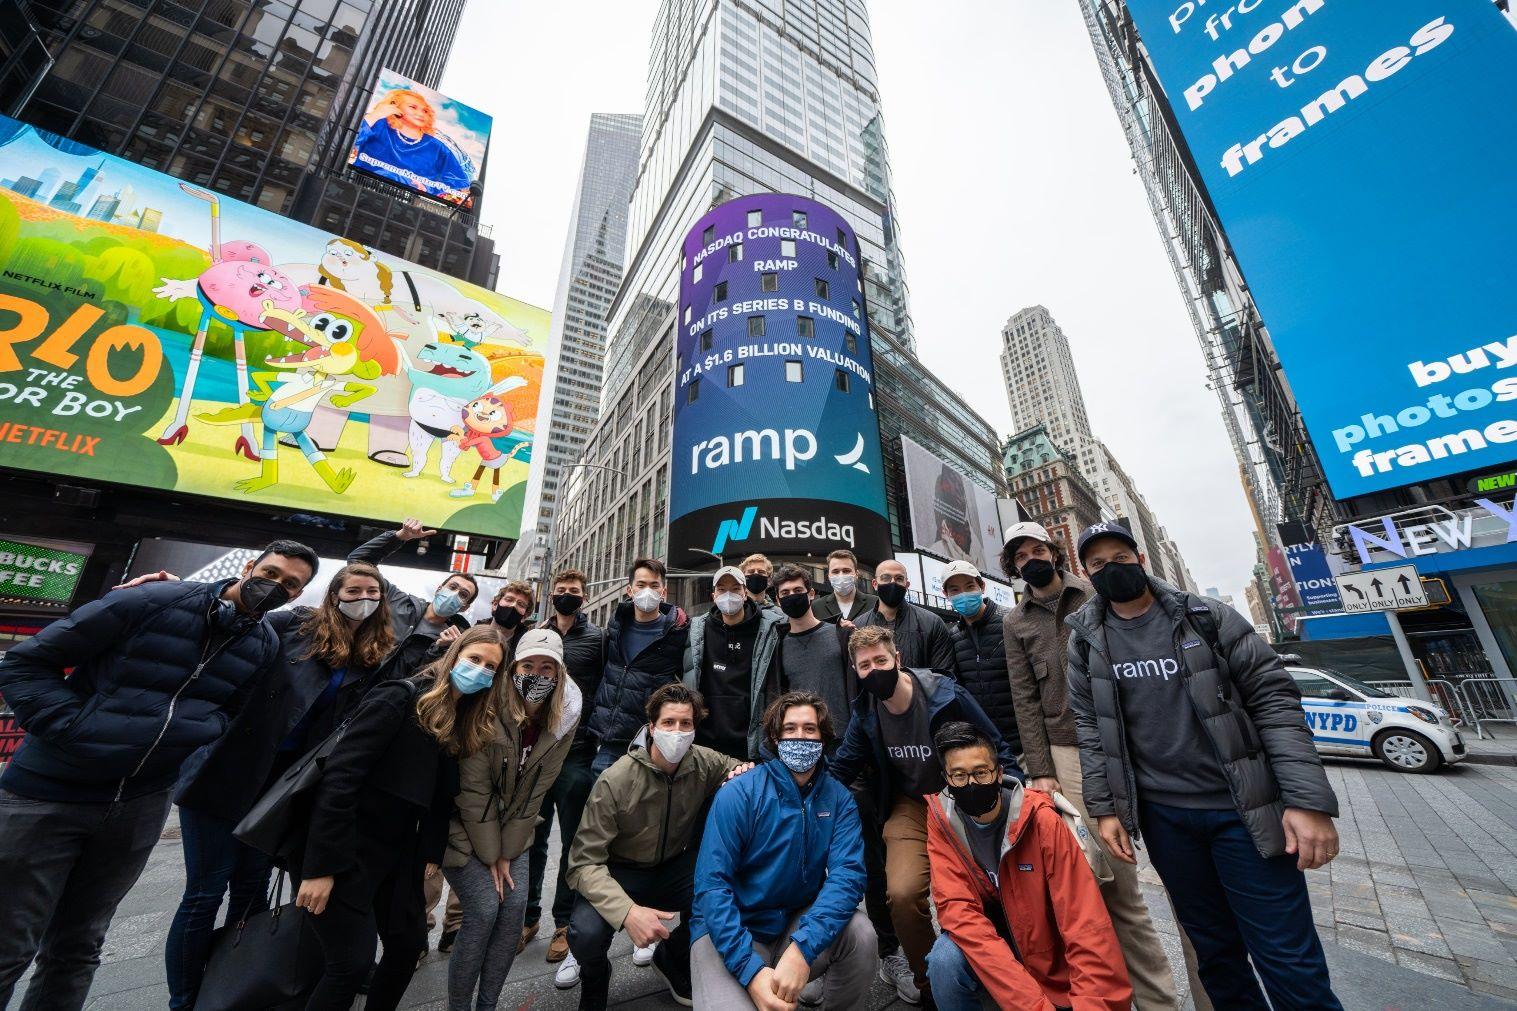 Ramp team in headquarters